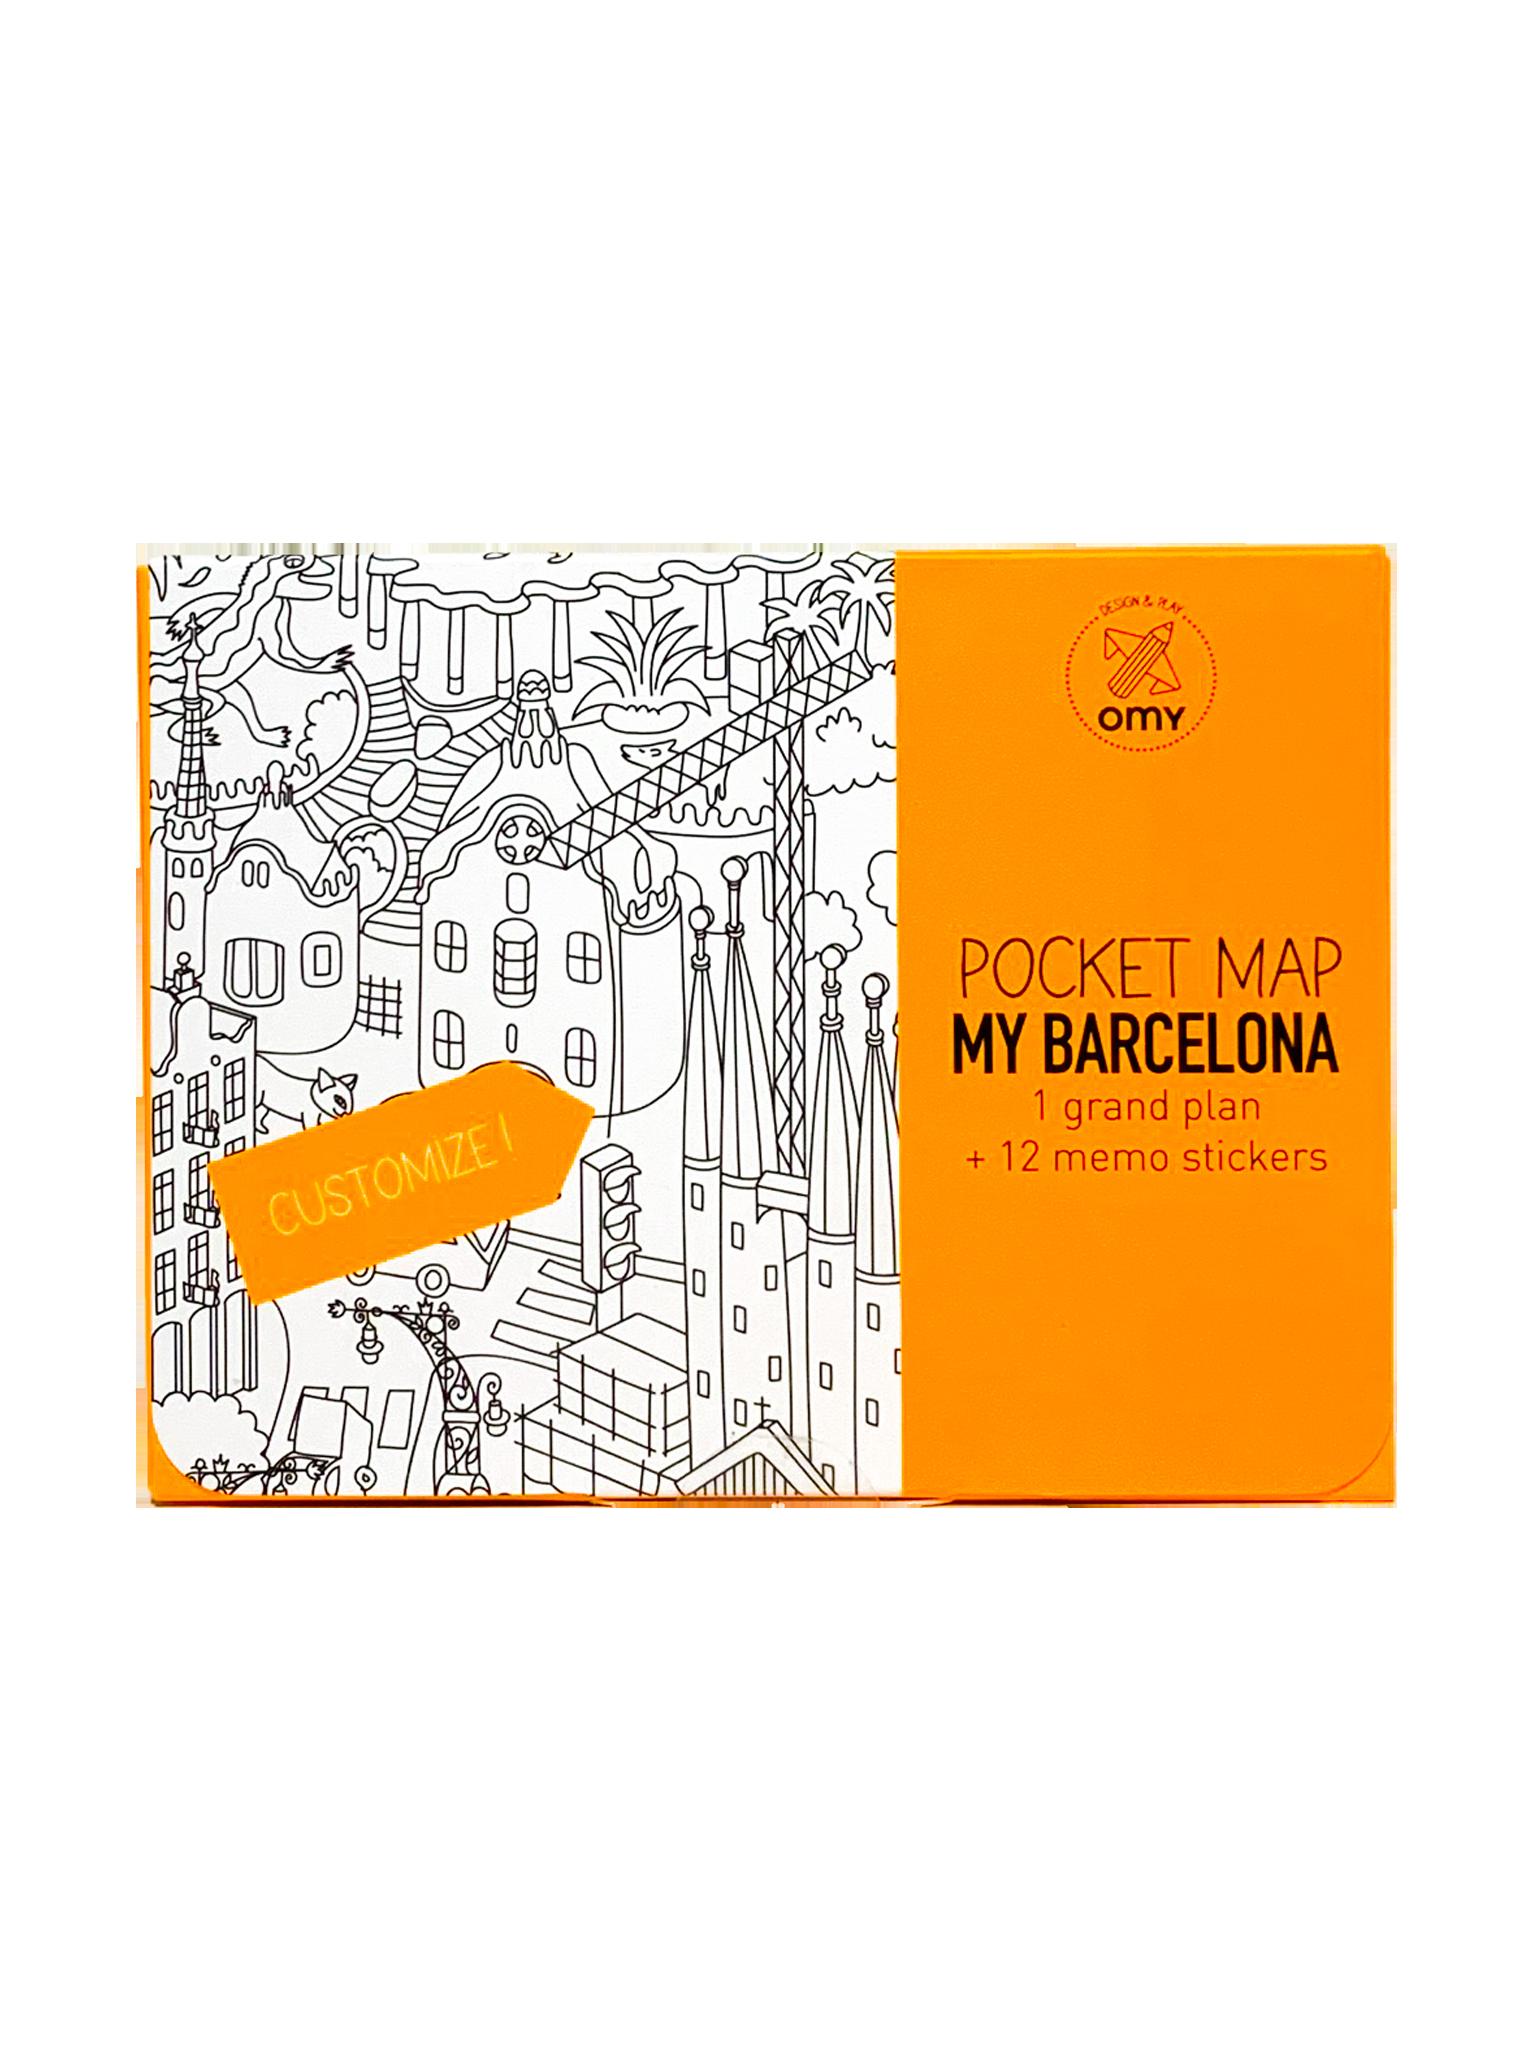 Omy Pocket Map My Barcelona